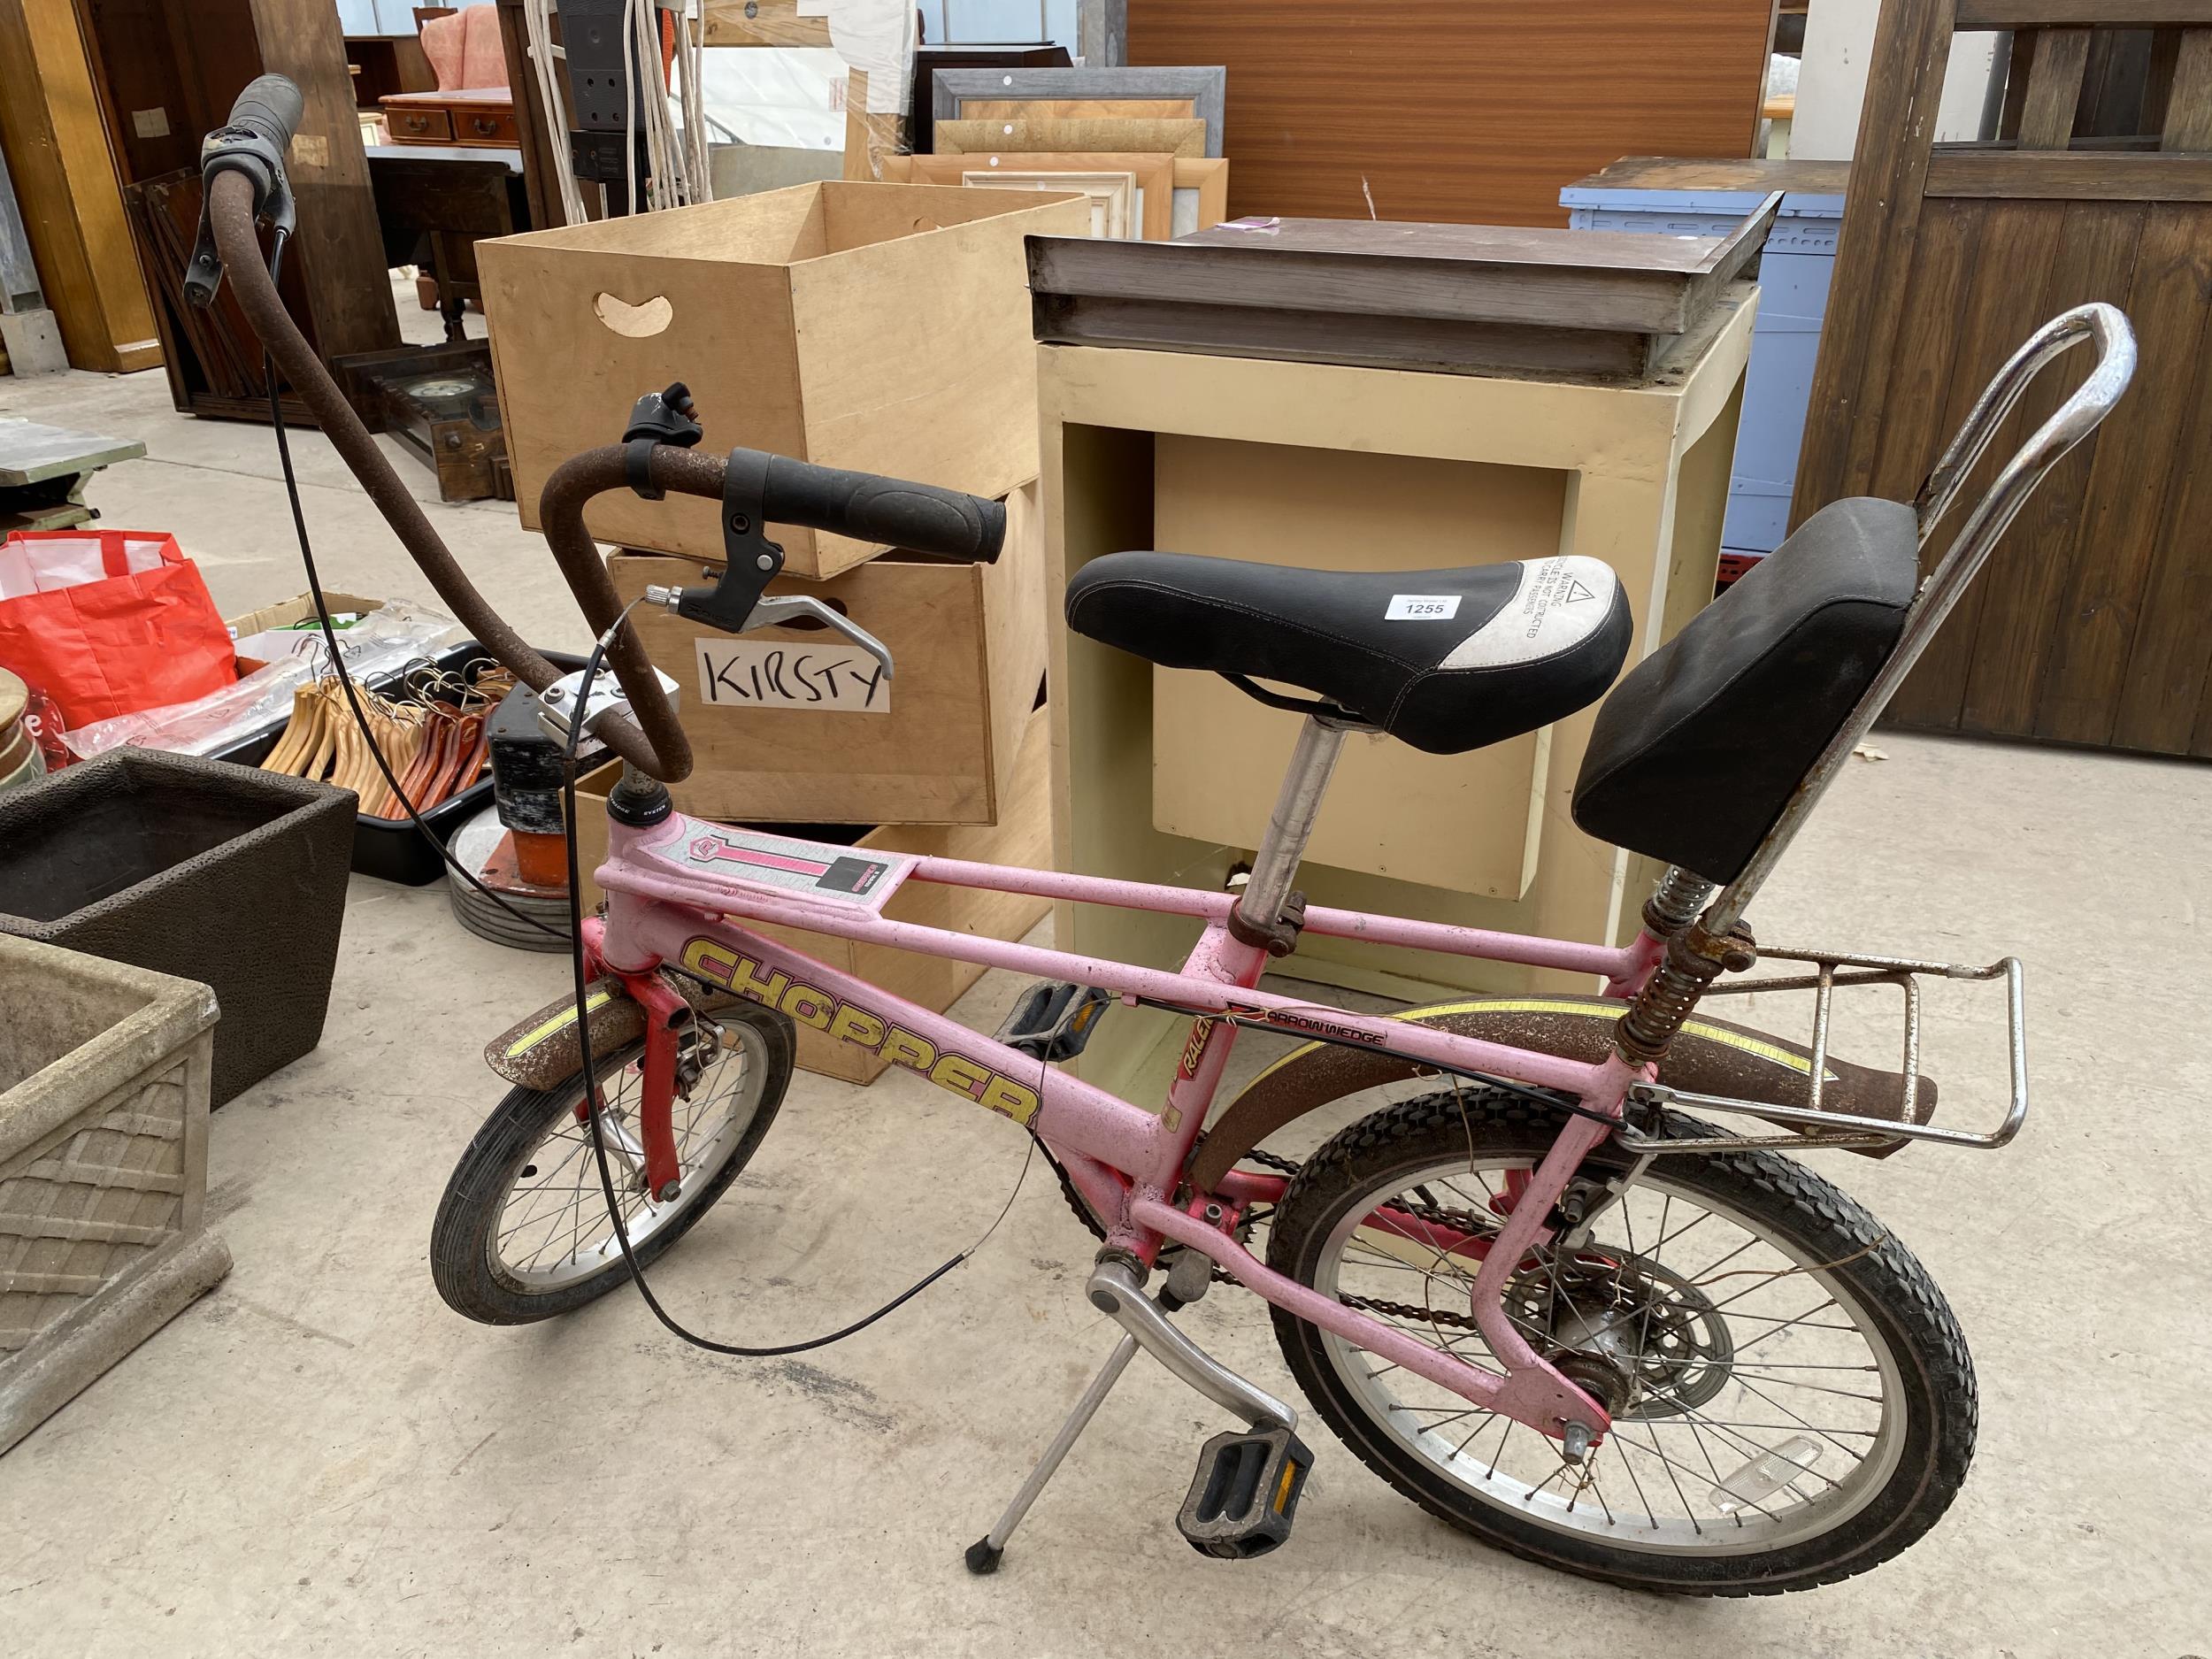 A RALEIGH CHOPPER MARK 3 BICYCLE